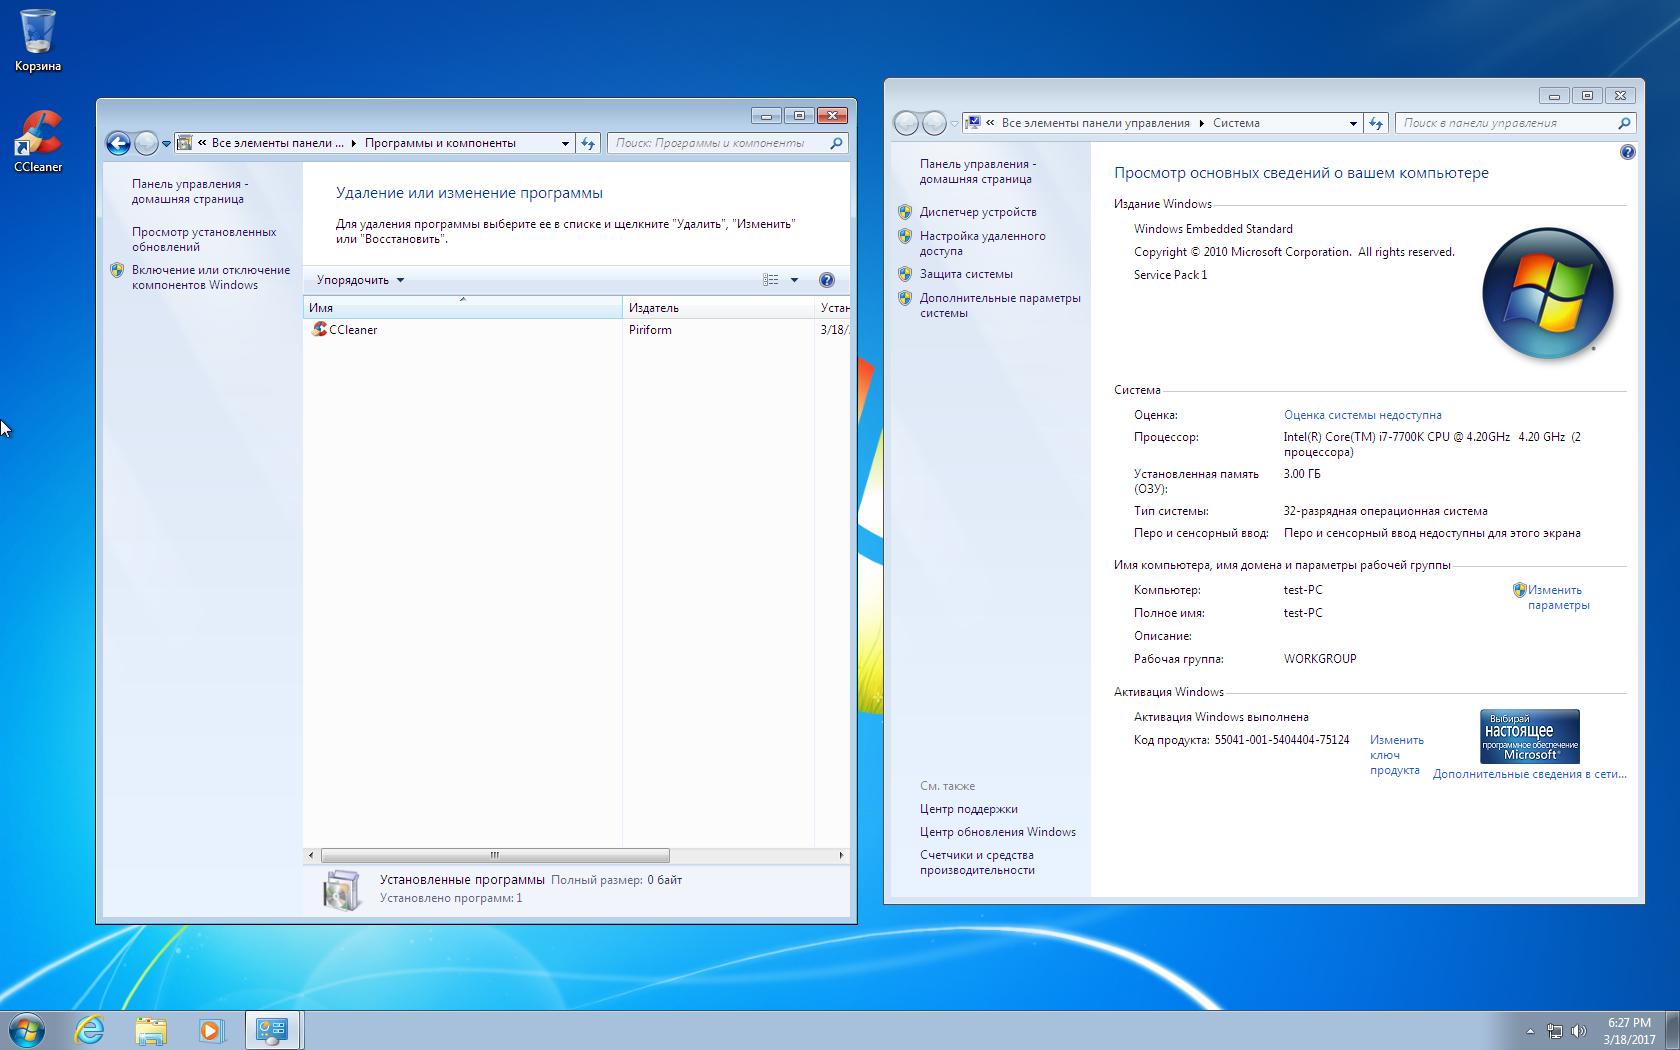 windows 7 game edition x64 rutracker